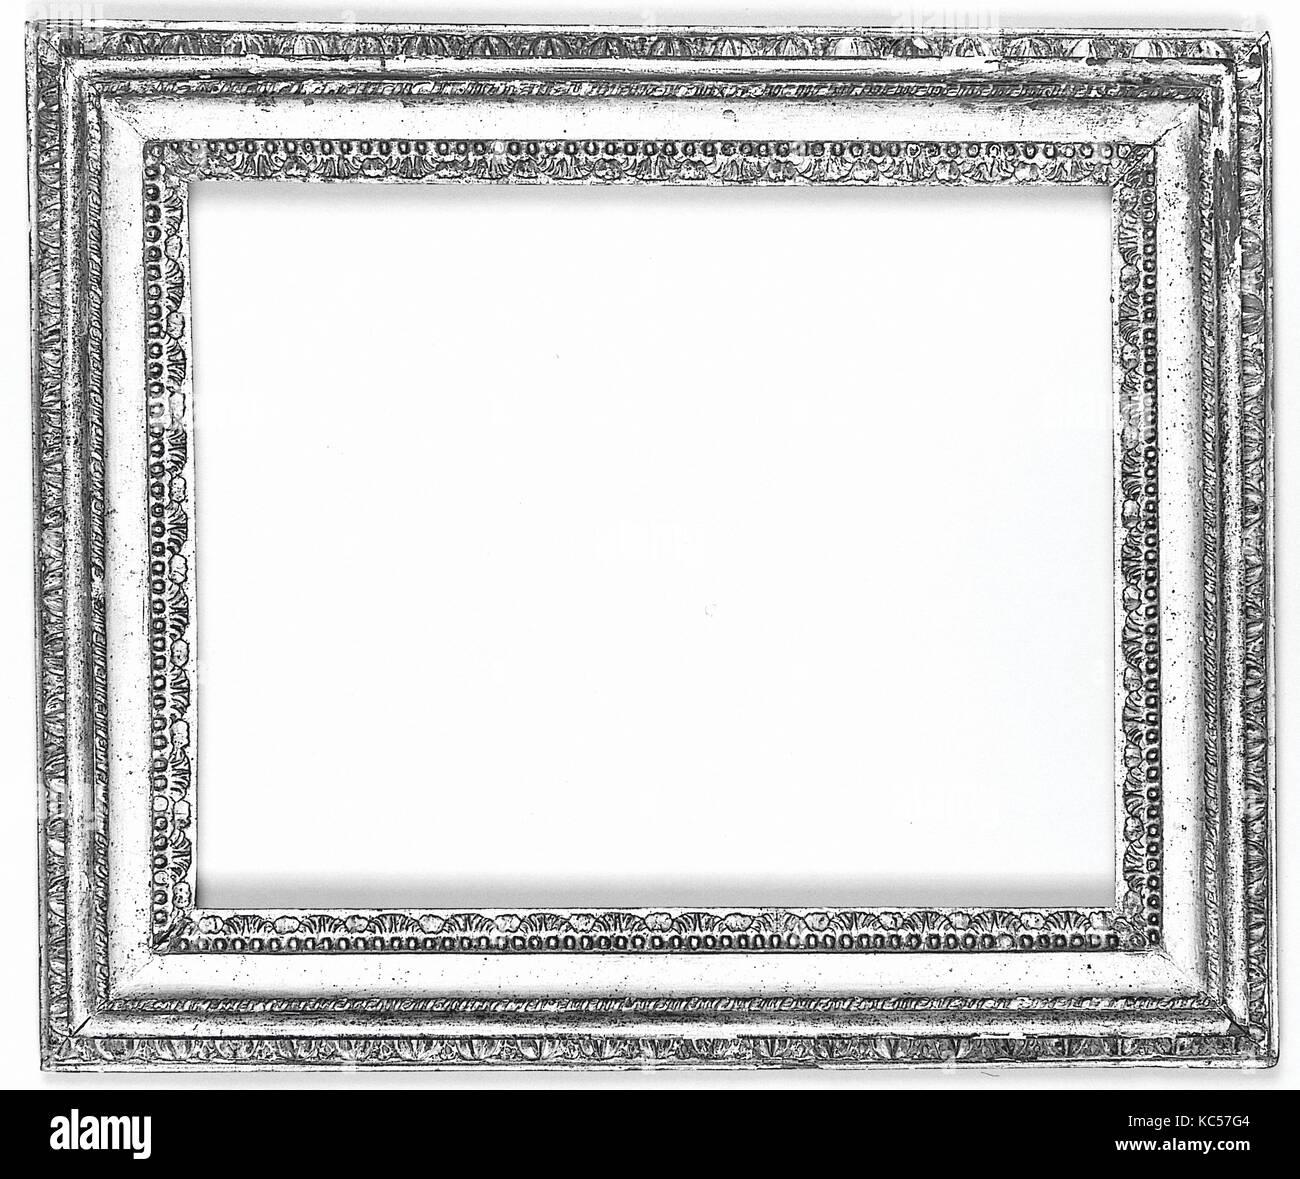 Salvator rosa marco, ca. 1740, Italia, Roma, álamos, 44,3 x 52,7, 30 ...